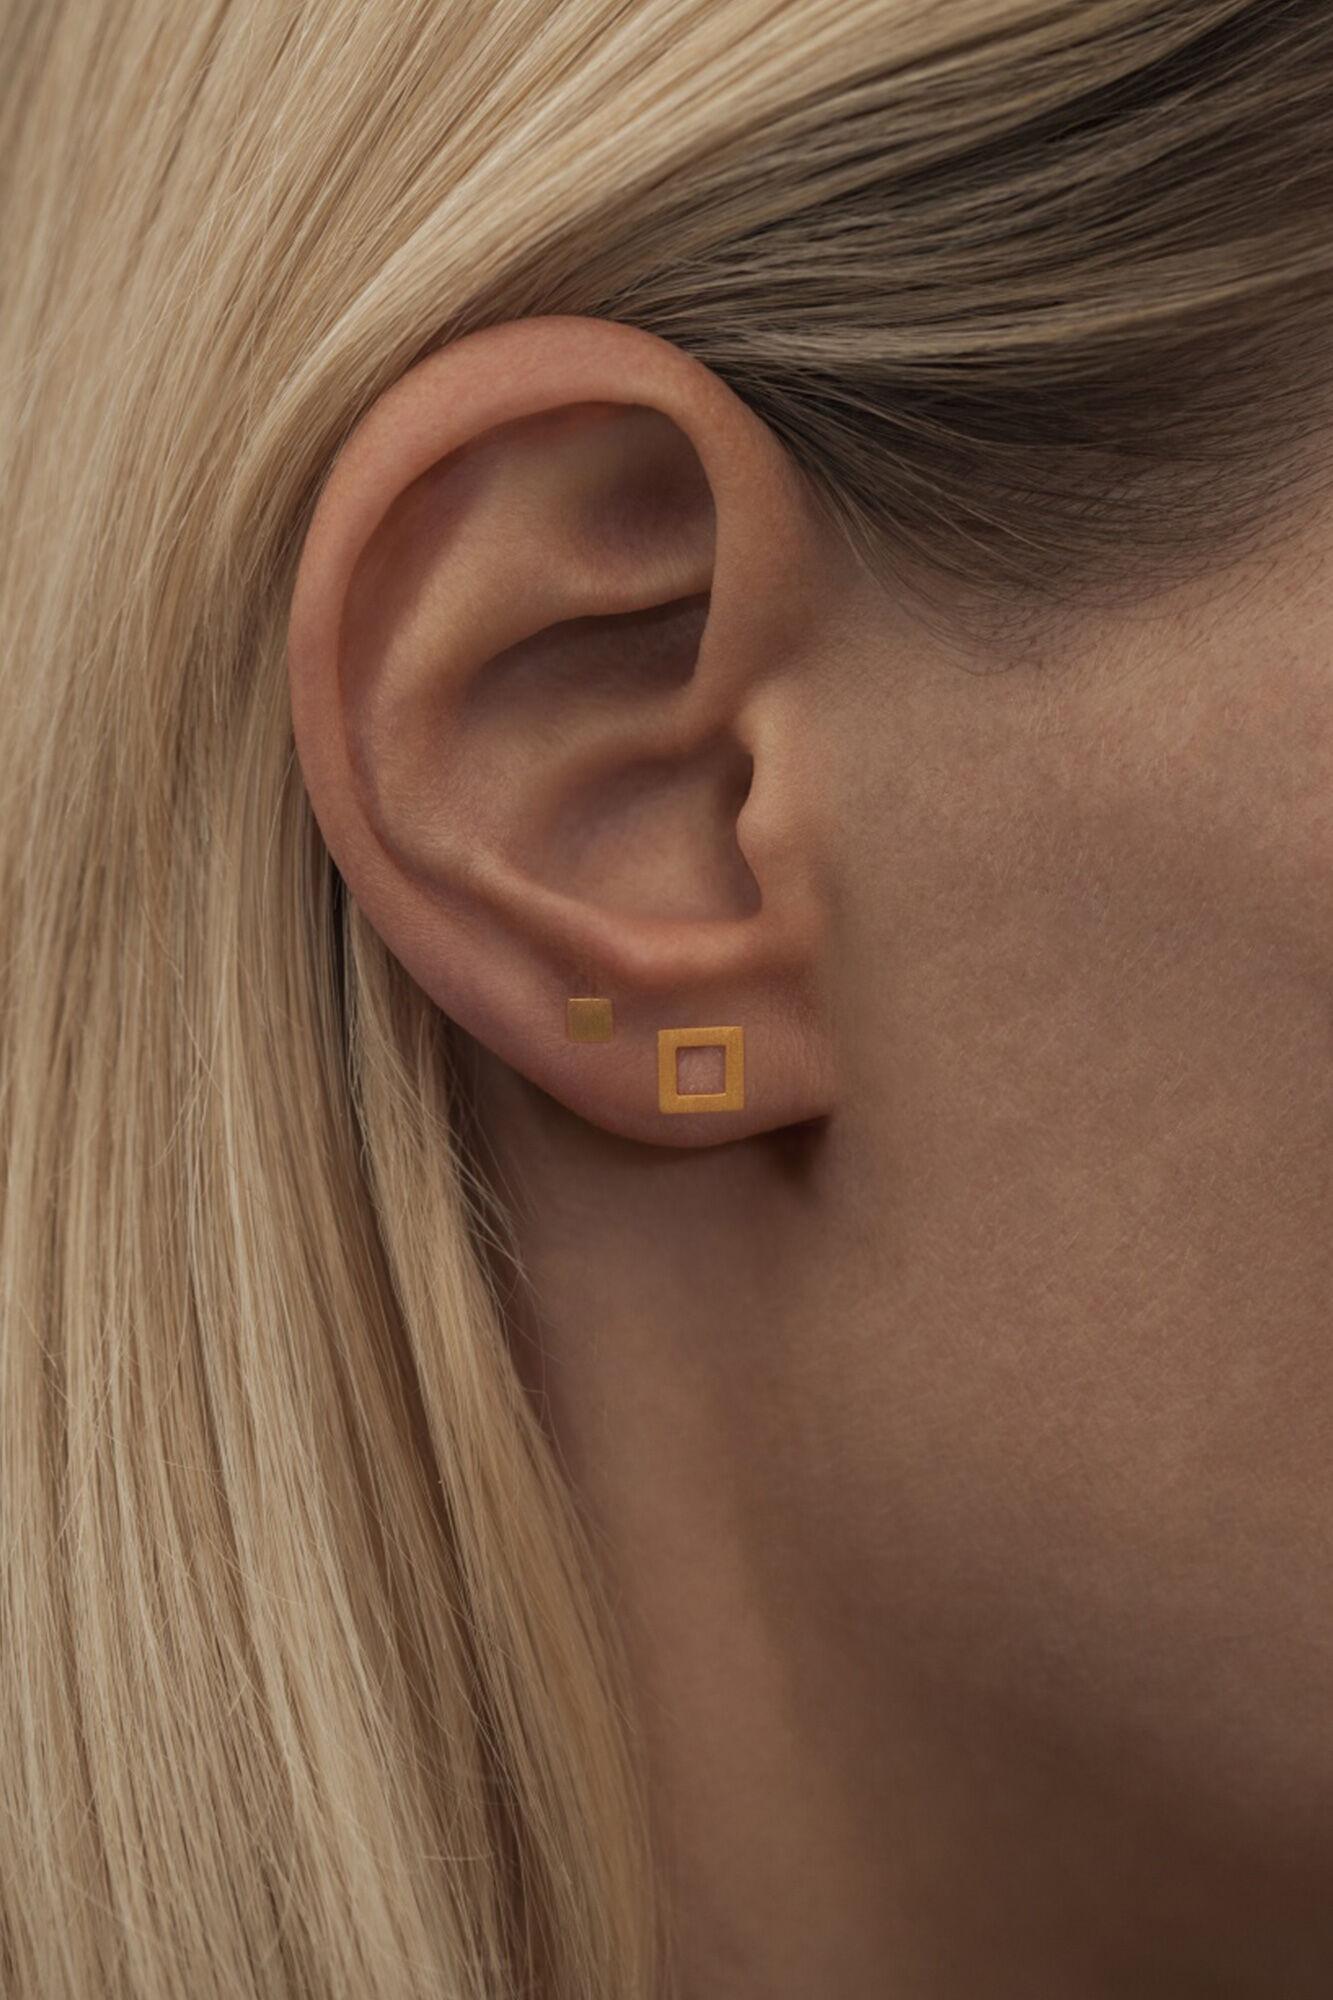 Family Ear Studs LULUE065, GOLD PLATED MATTE